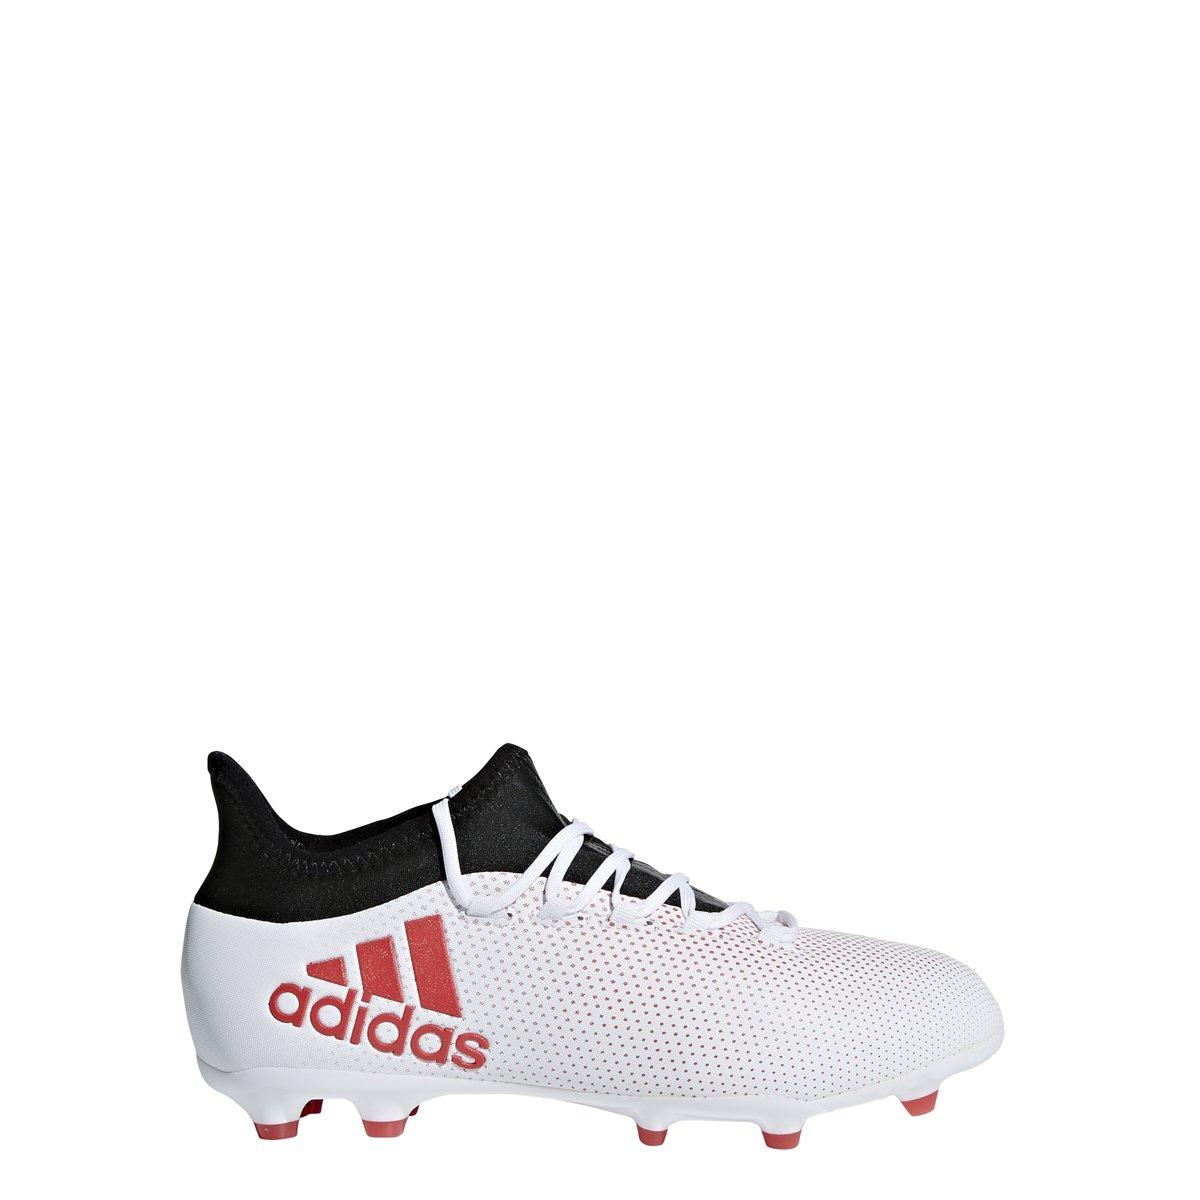 605b542ed653 Amazon.com   adidas X 17.1 FG Cleat Kid's Soccer   Soccer